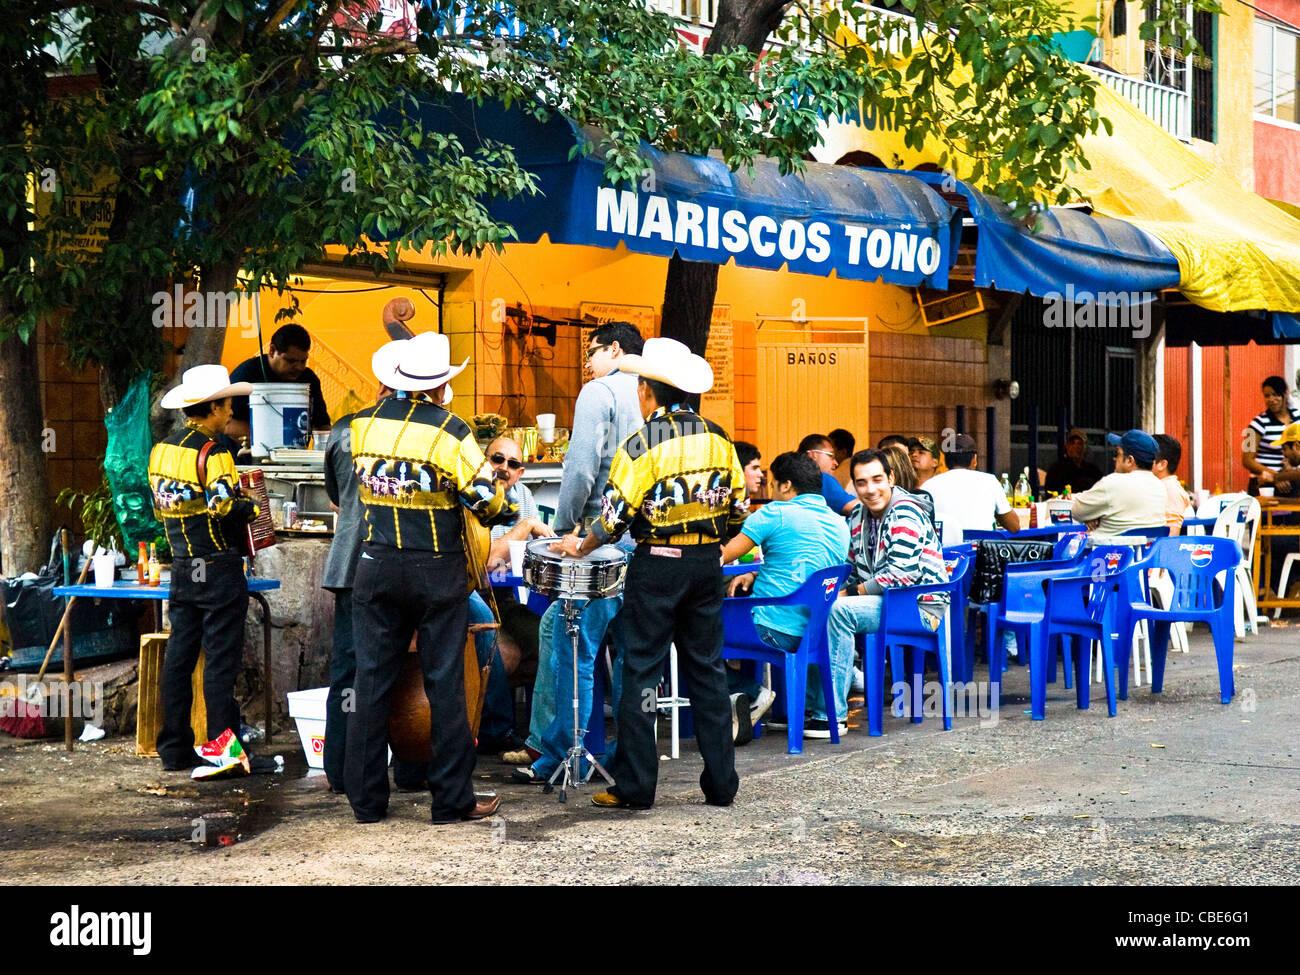 Mariachi band at sidewalk cafe in old town Mazatlan, Sinaloa, Mexico. - Stock Image